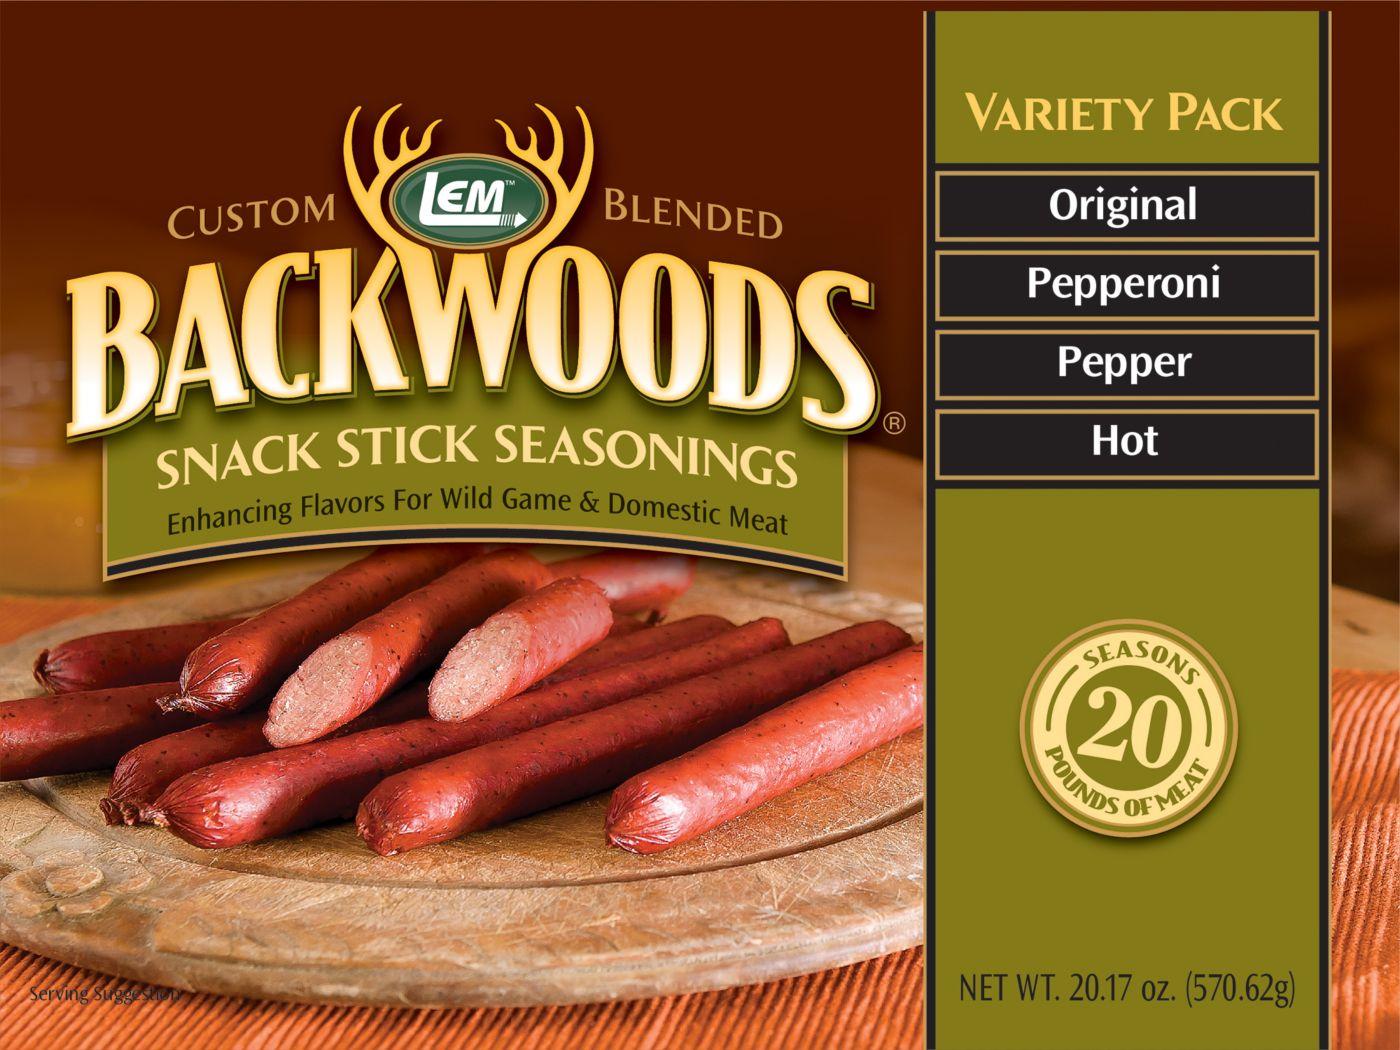 LEM Backwoods Snack Stick Seasoning Variety Pack